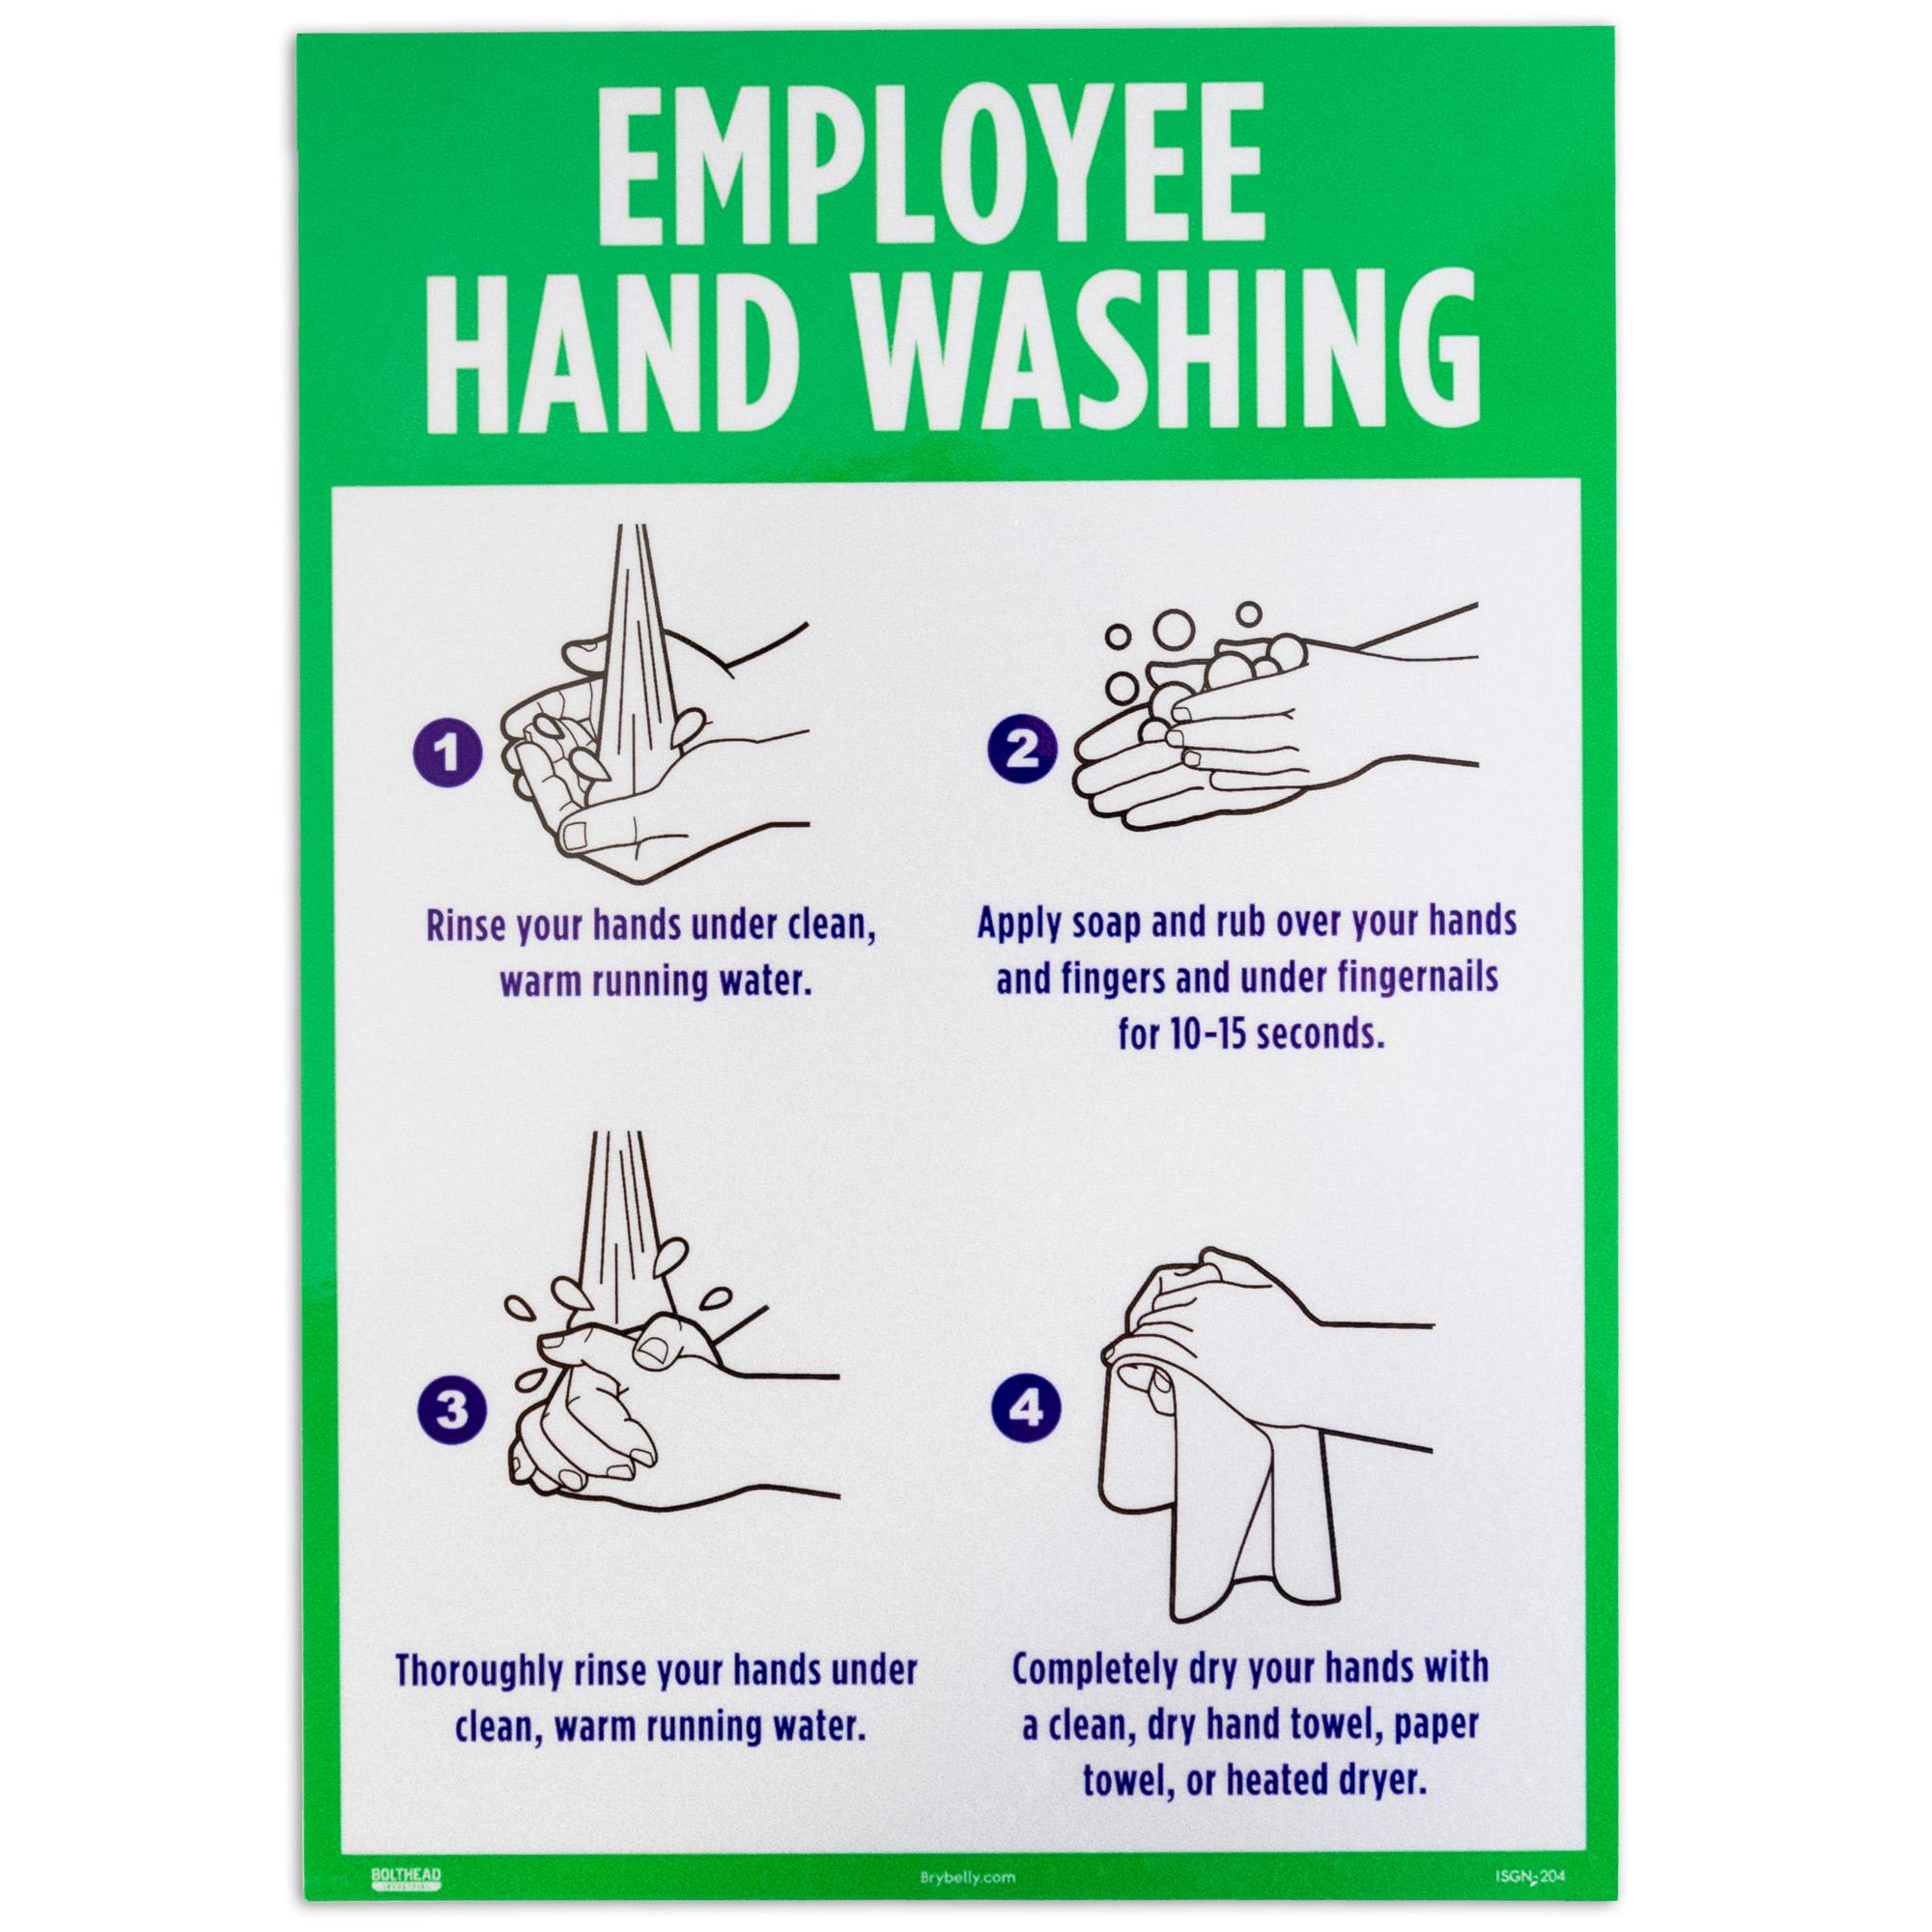 Employee Hand Washing Self-Adhesive Decal